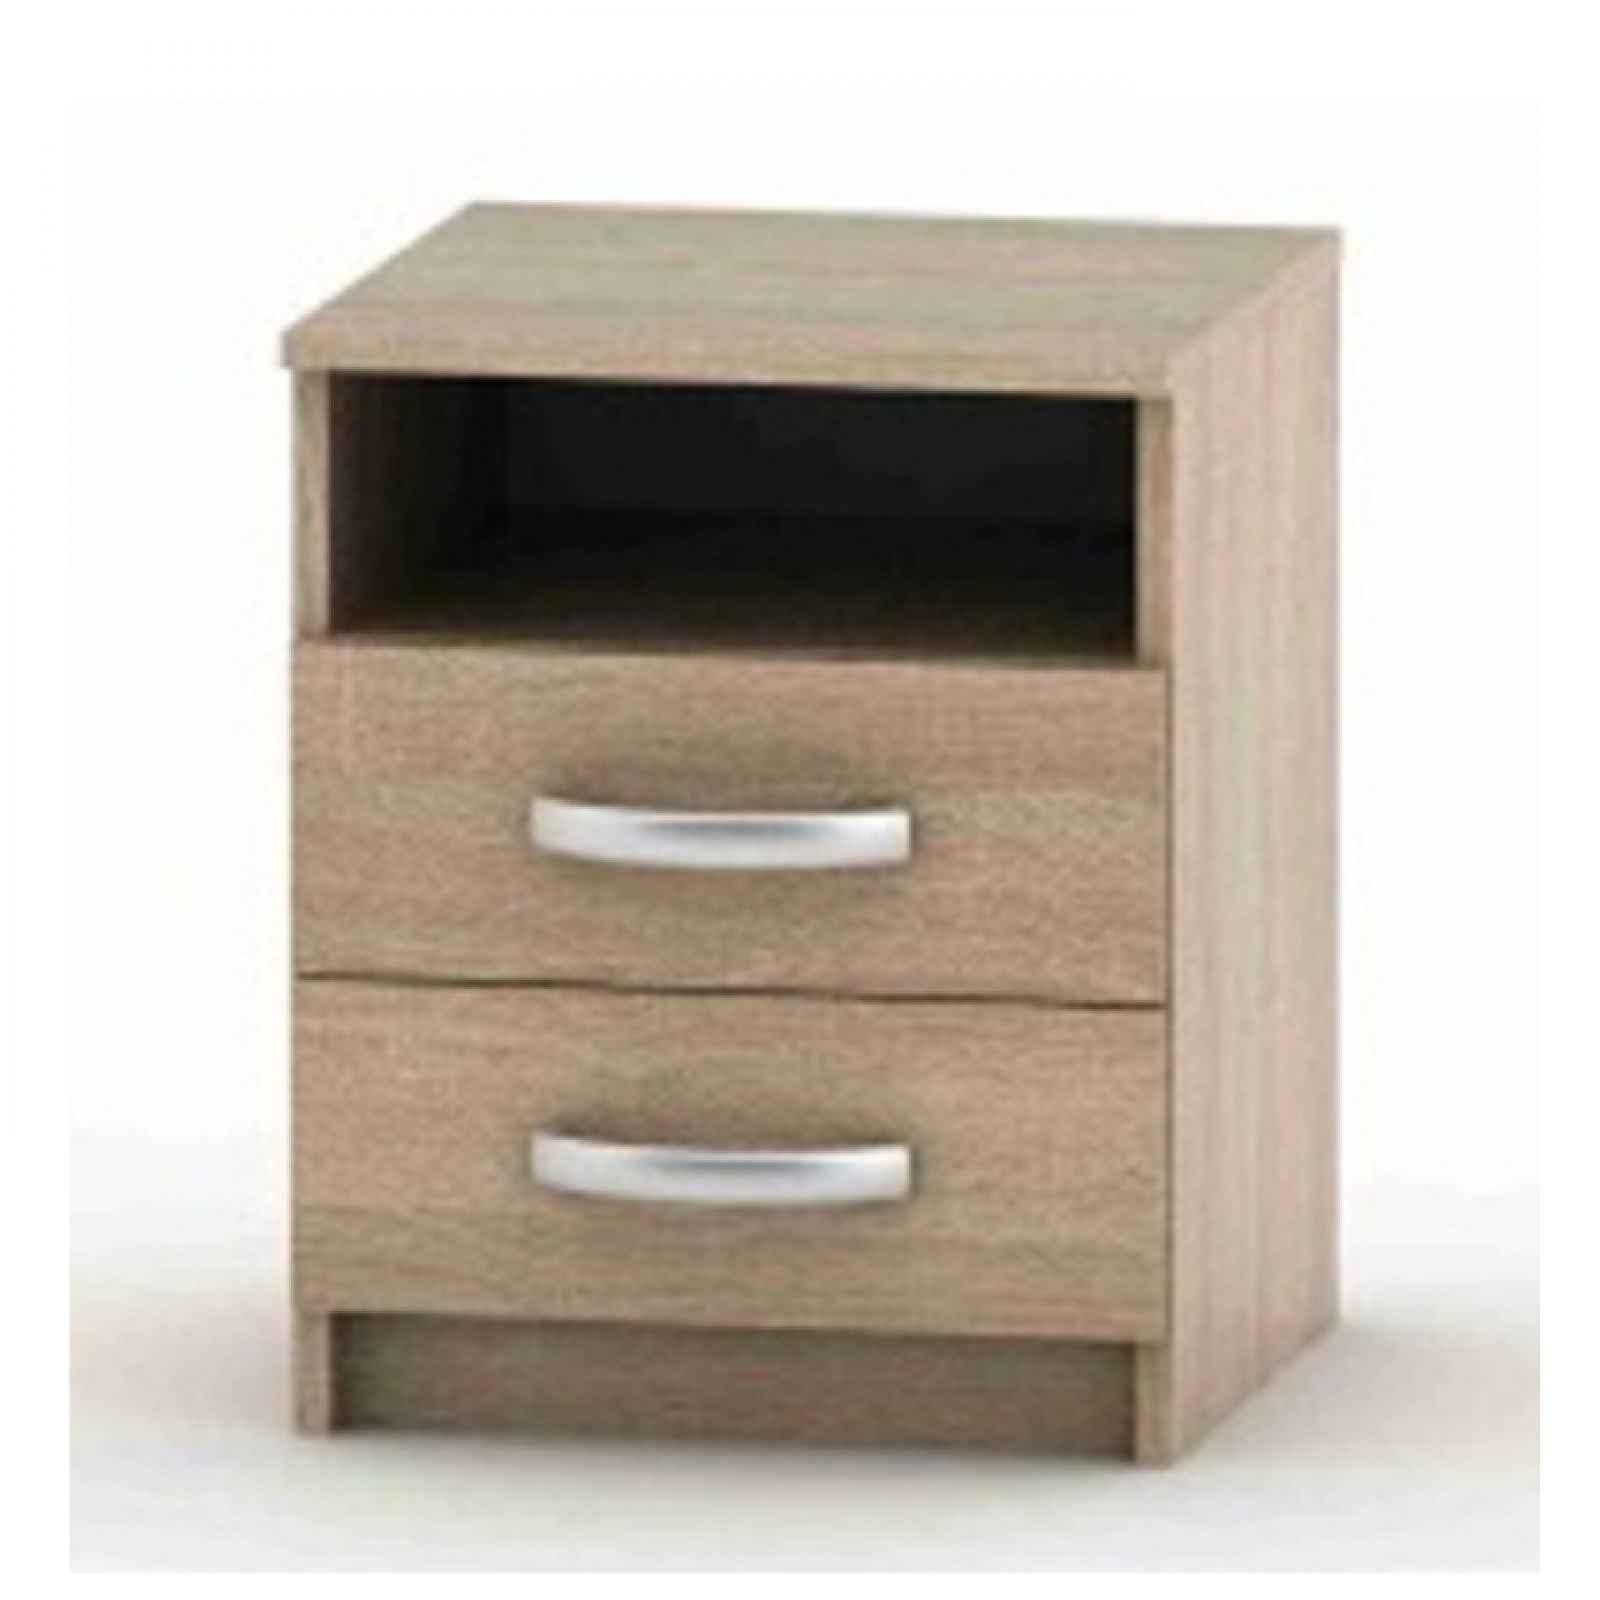 Noční stolek s 2 šuplíky, dub sonoma, BETTY 2 0000039930 Tempo Kondela